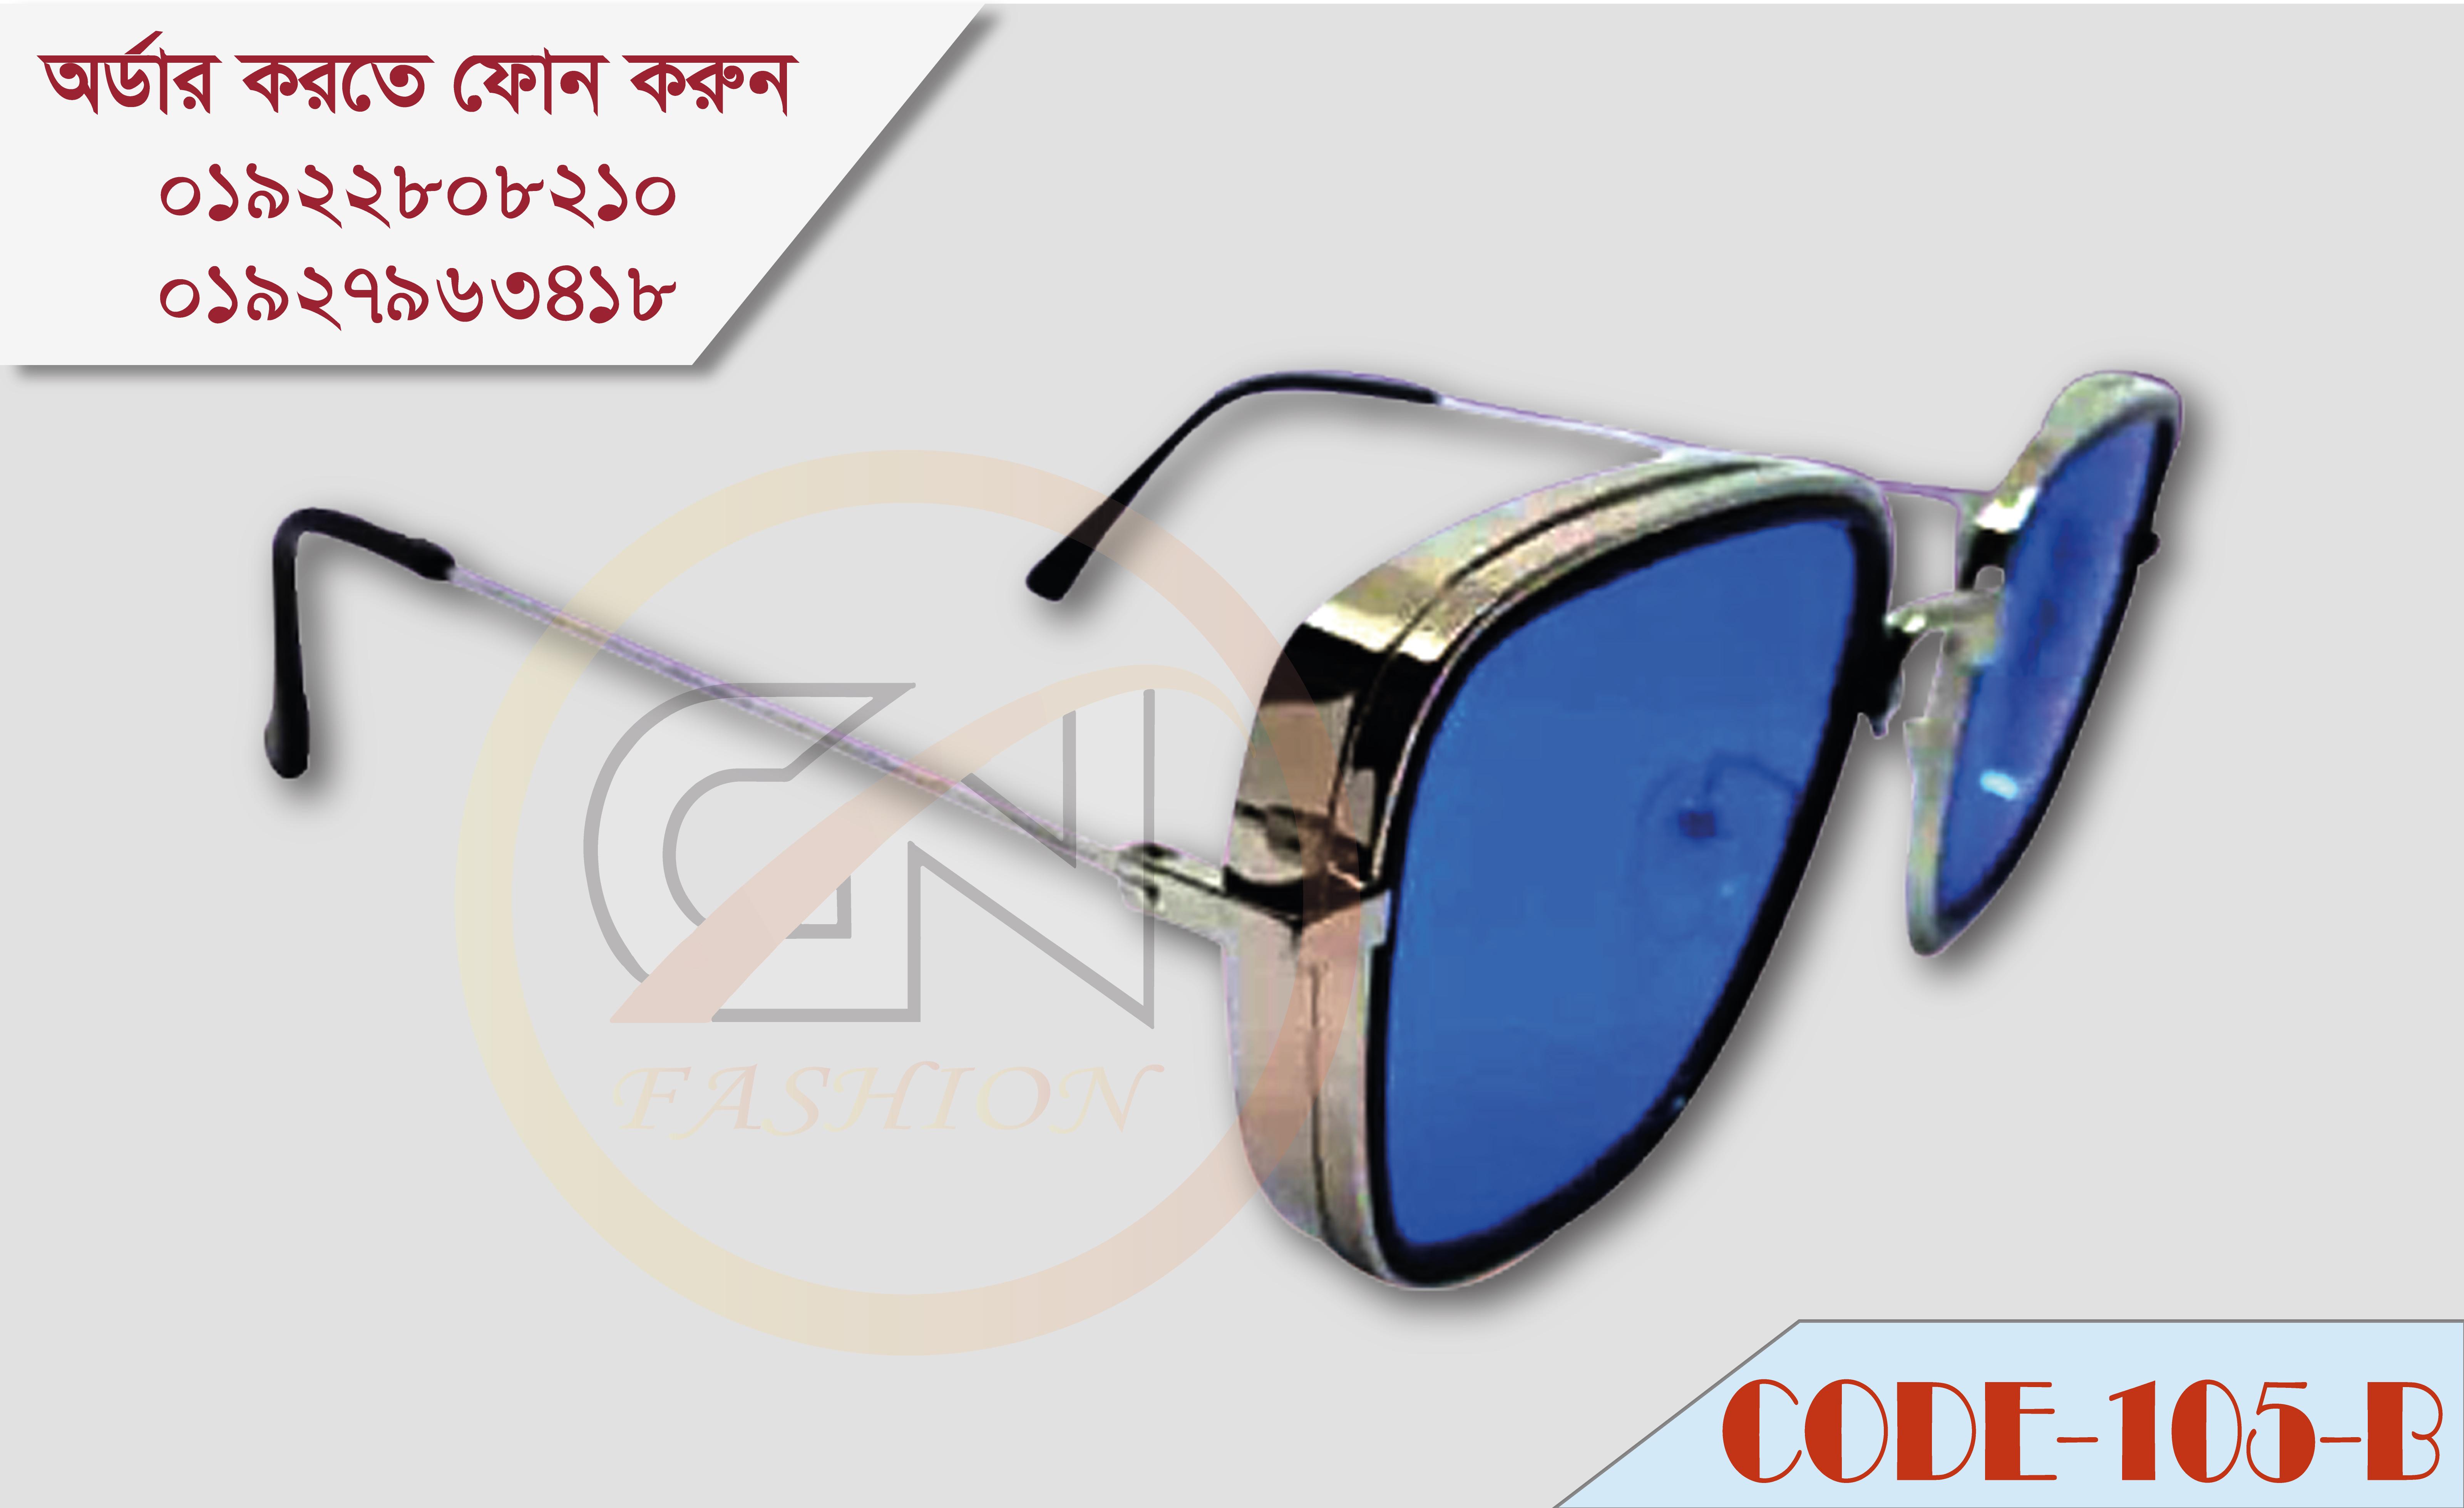 Kabir Singh Premium Quality Steel Body Sunglasses With Box